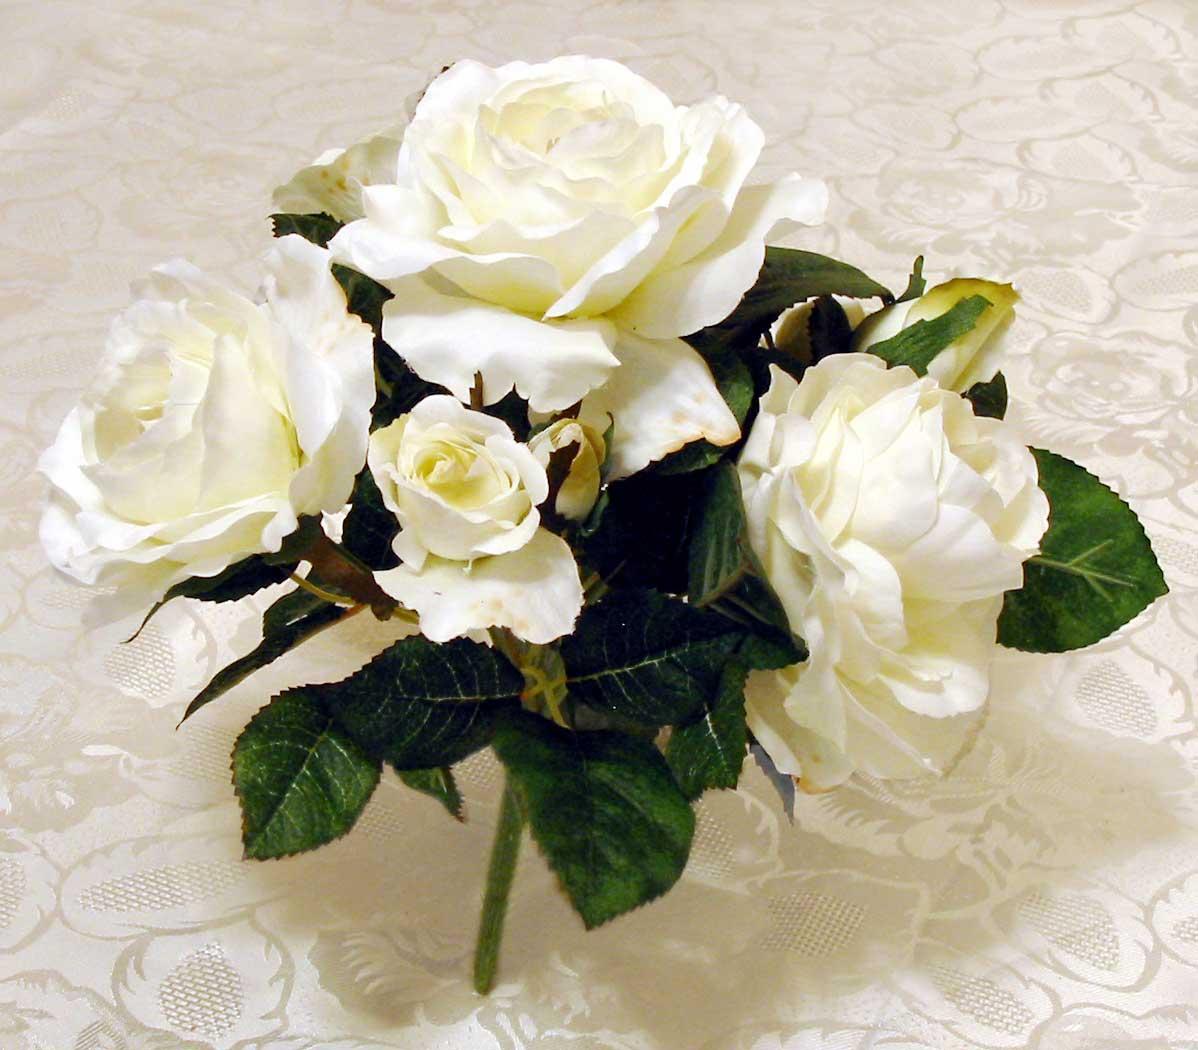 http://4.bp.blogspot.com/-ptbNnErQbsE/UFhWWicKTSI/AAAAAAAAAnI/xLI9VlOnwas/s1600/white+roses+flowers+wallpapers+%282%29.jpg